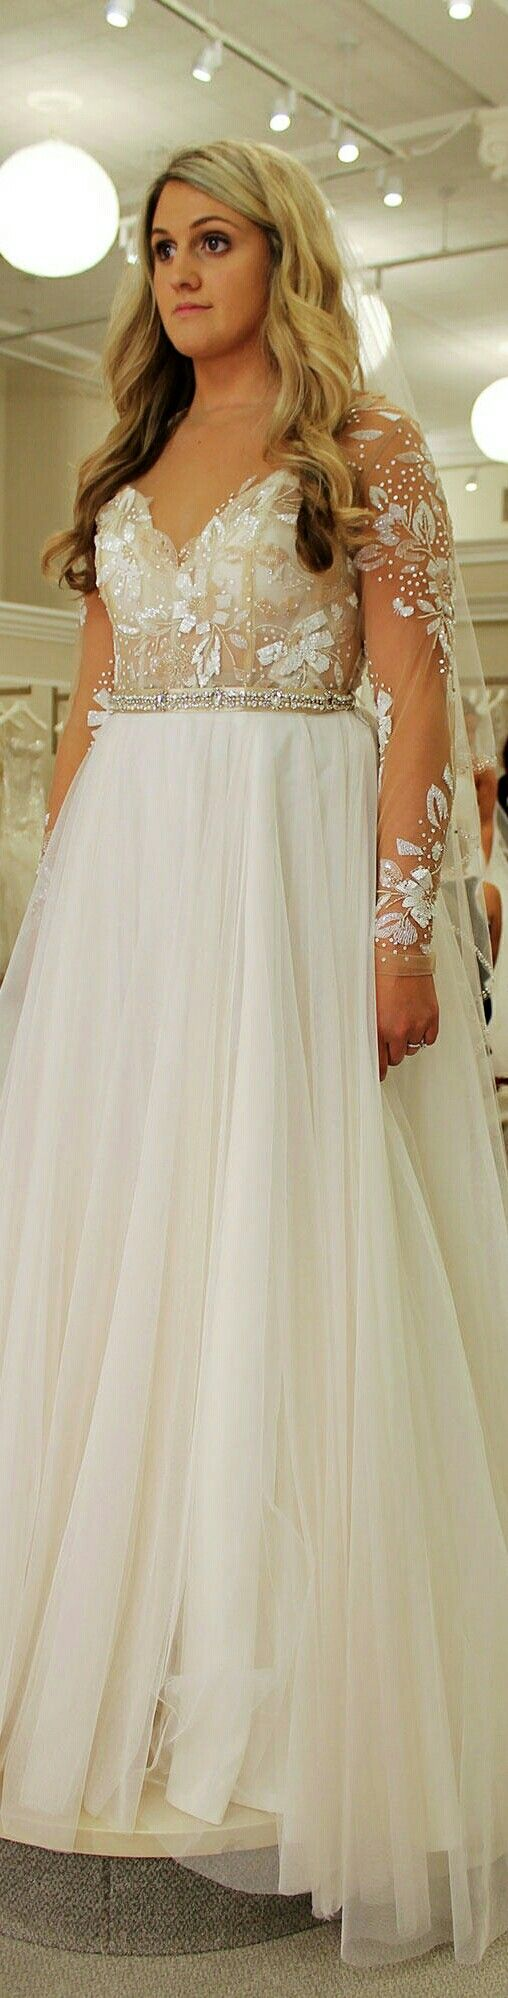 Lisa robertson in wedding dress - Karyssa Koprusak Is Trying On A Wedding Dress For Season 14 The Dress